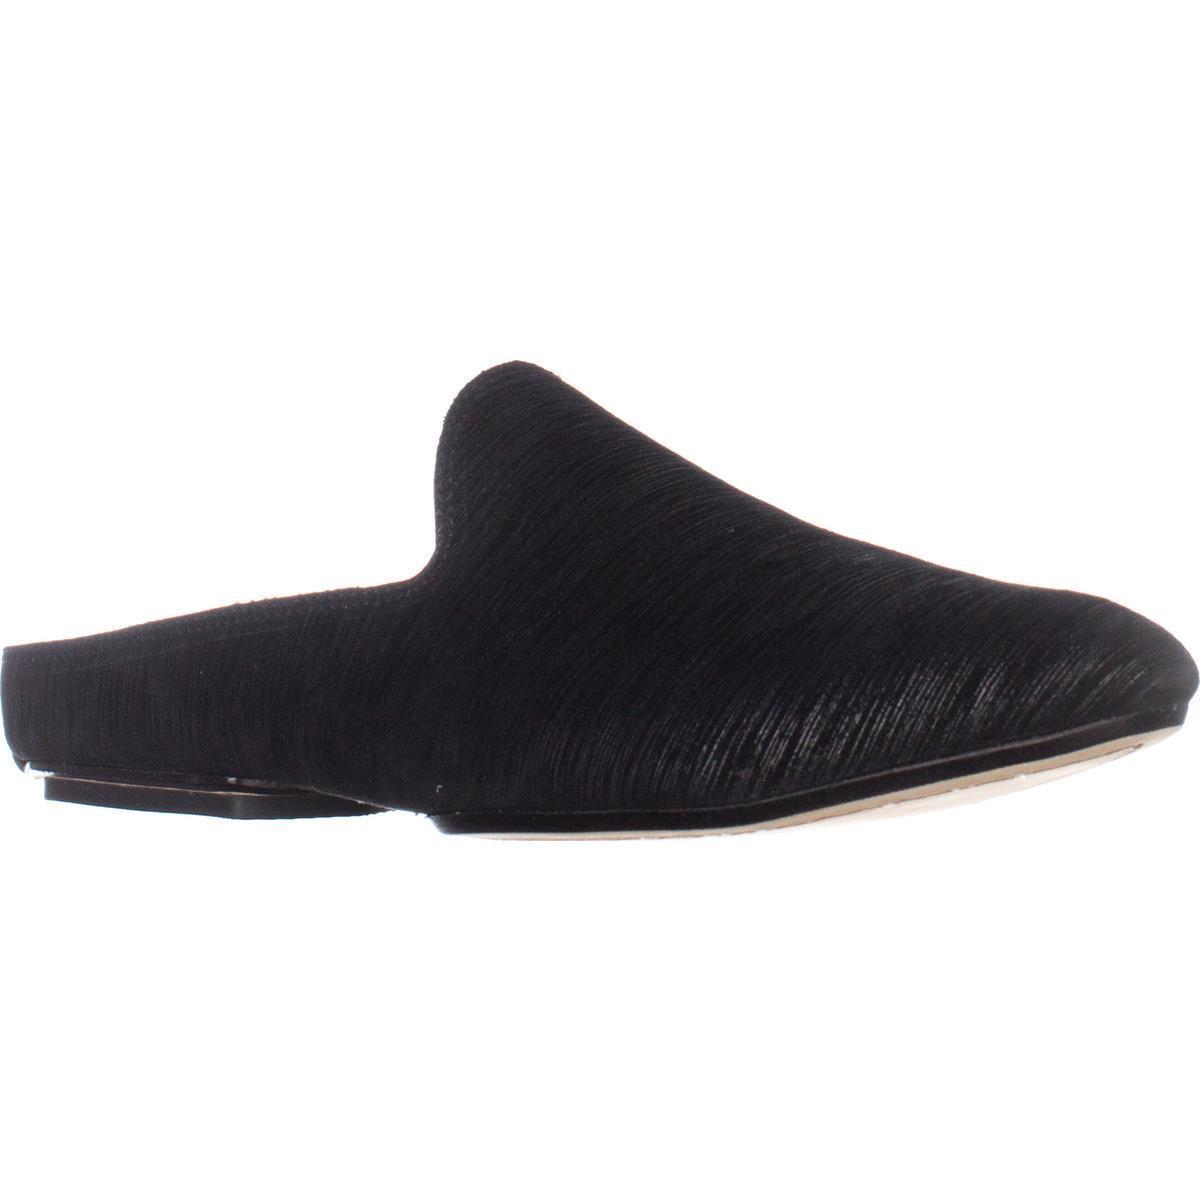 Womens Donald J Pliner Rue Flat Slip-On Mules, Black Black by Donald J Pliner